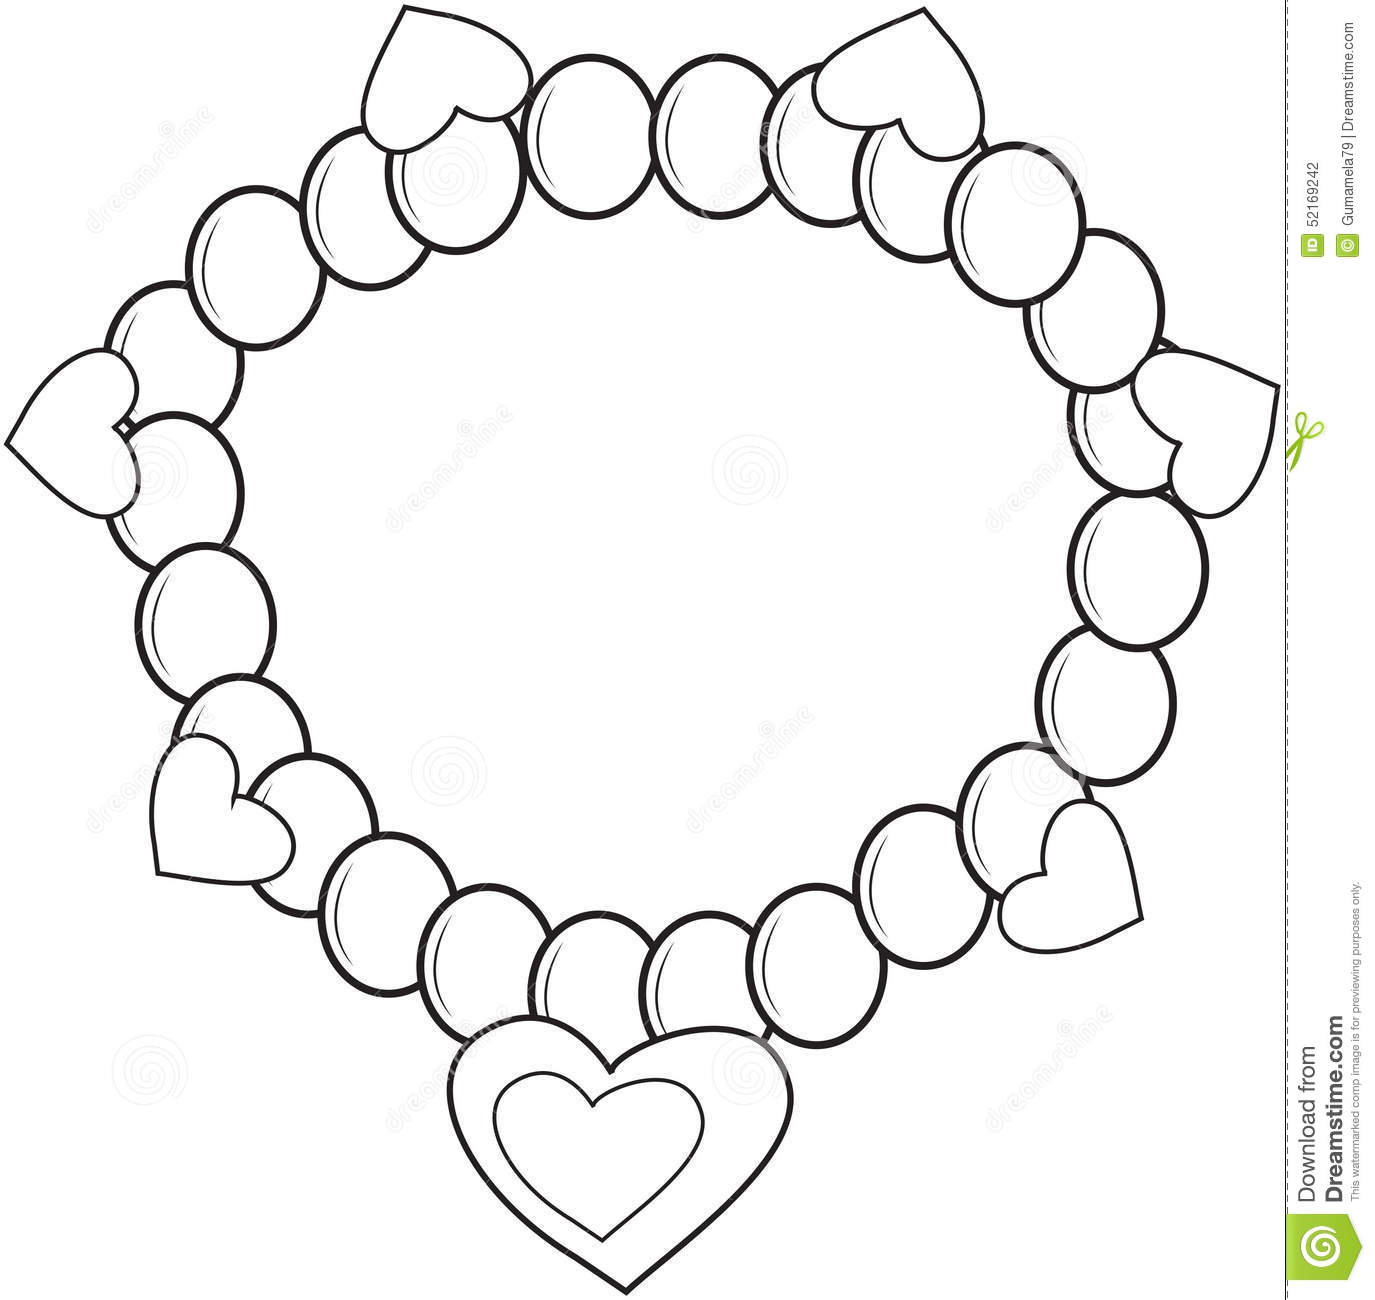 Download Bracelet Coloring For Free